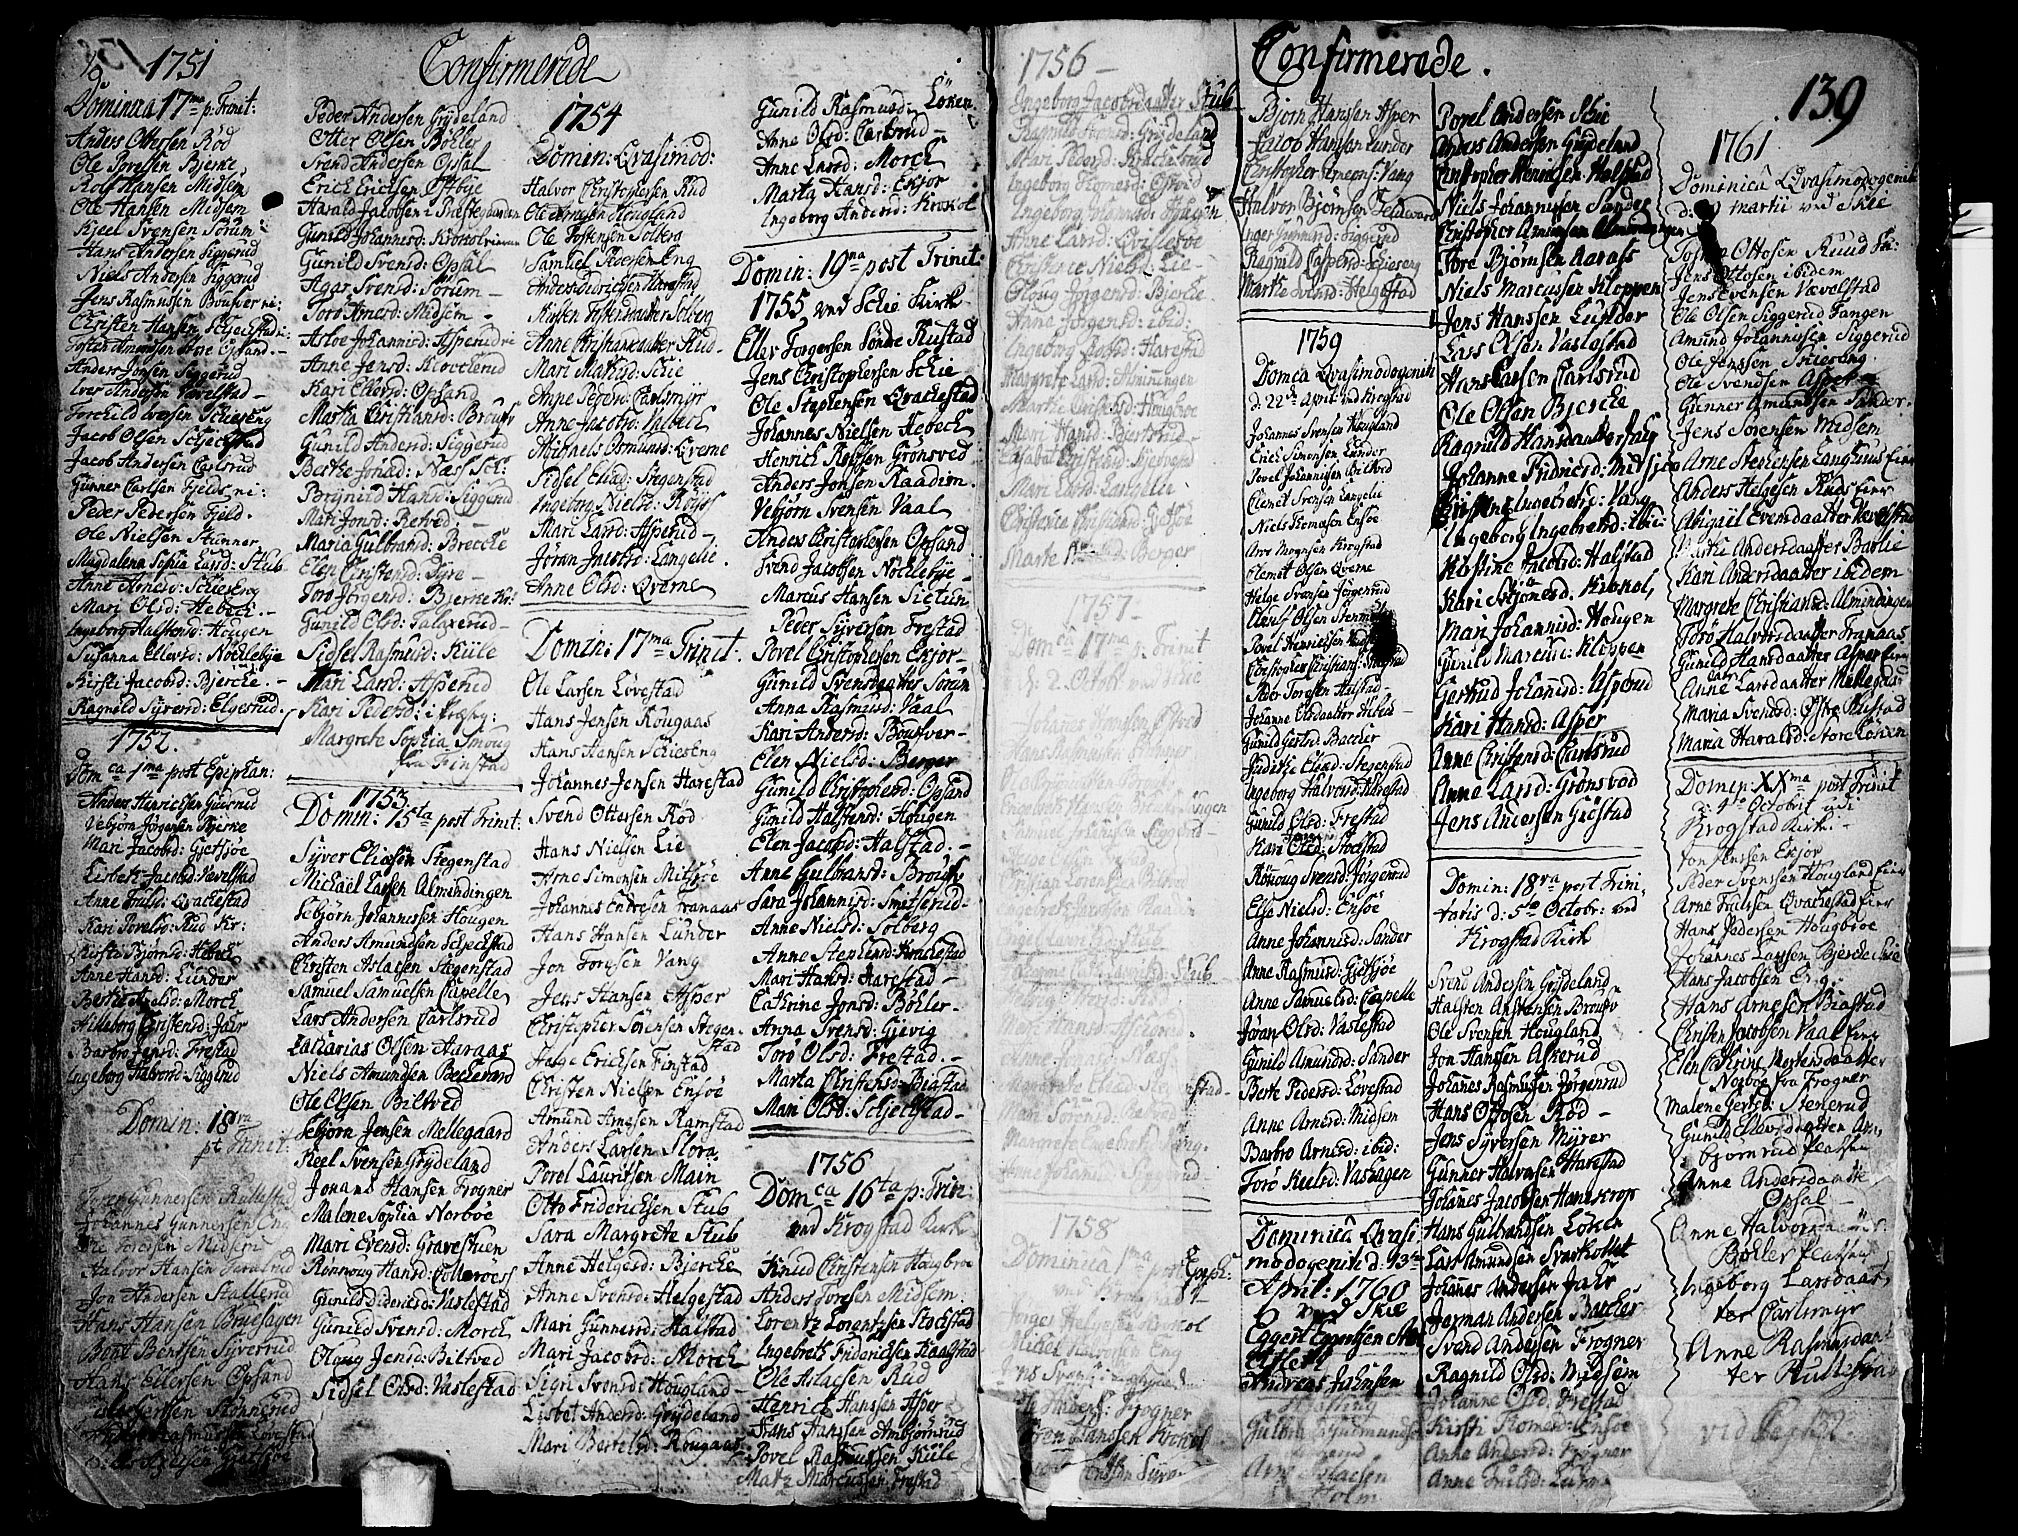 SAO, Kråkstad prestekontor Kirkebøker, F/Fa/L0001: Ministerialbok nr. I 1, 1736-1785, s. 139